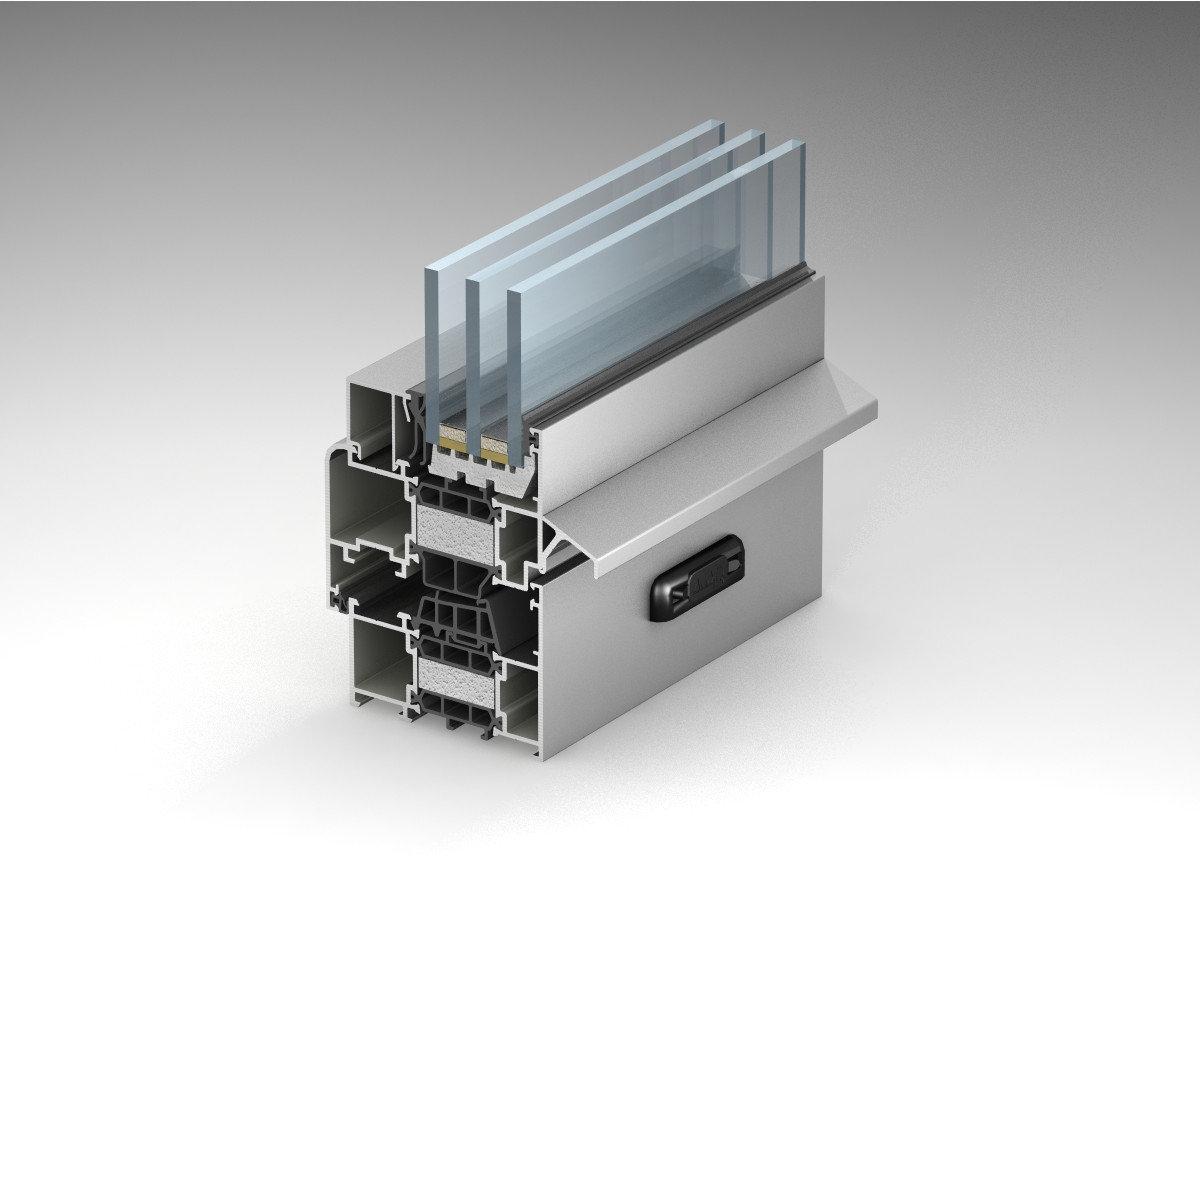 Window and Door System with Thermal Break